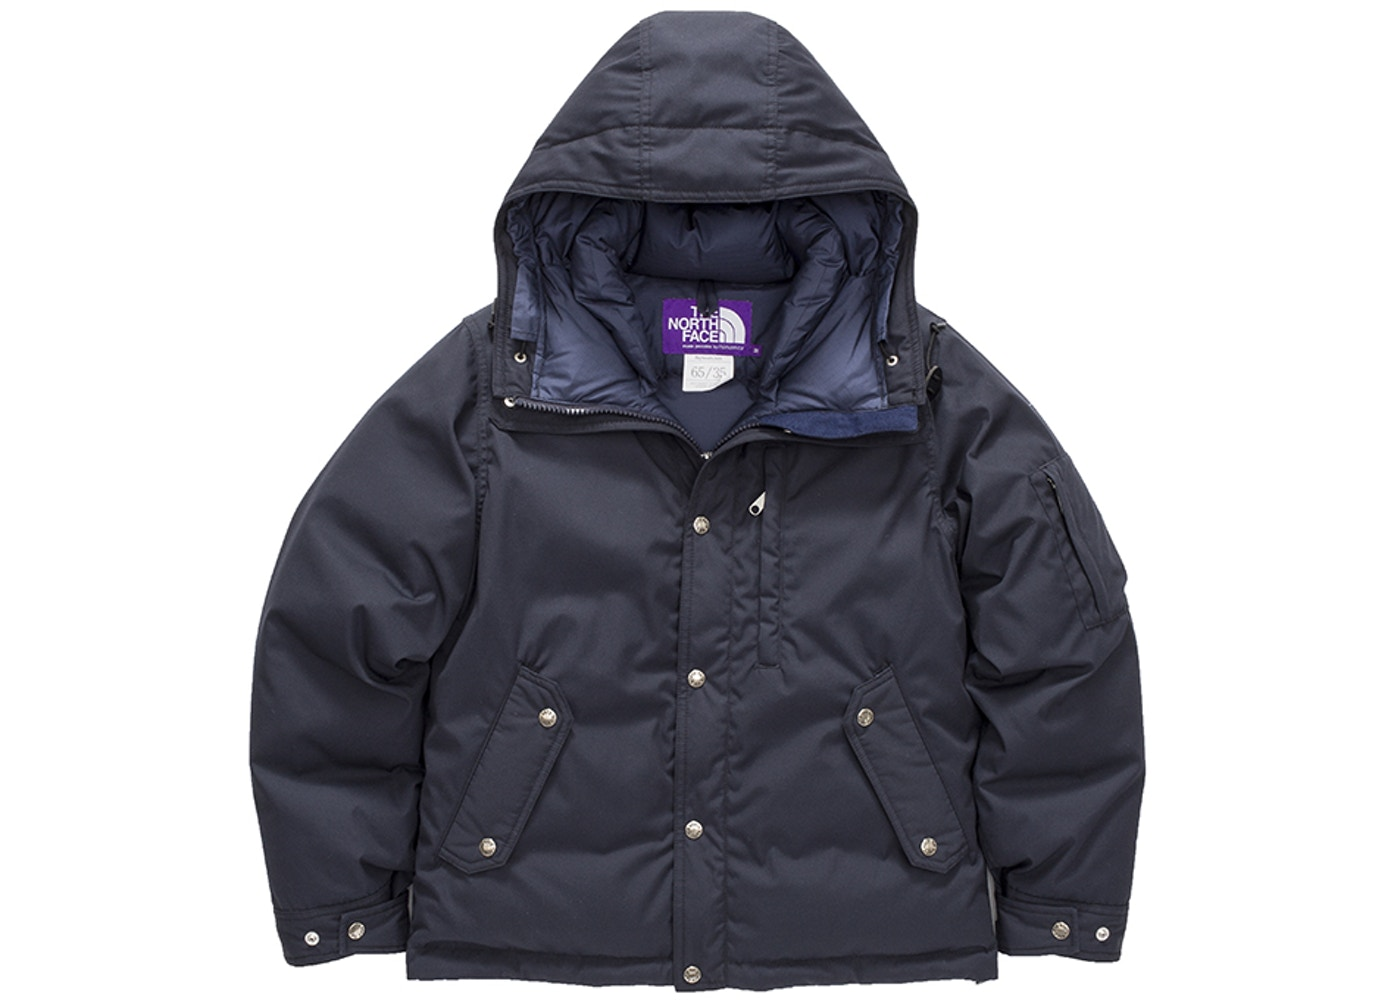 dfe13c6dd The North Face Purple Label 65/35 Mountain Short Down Parka Dark ...